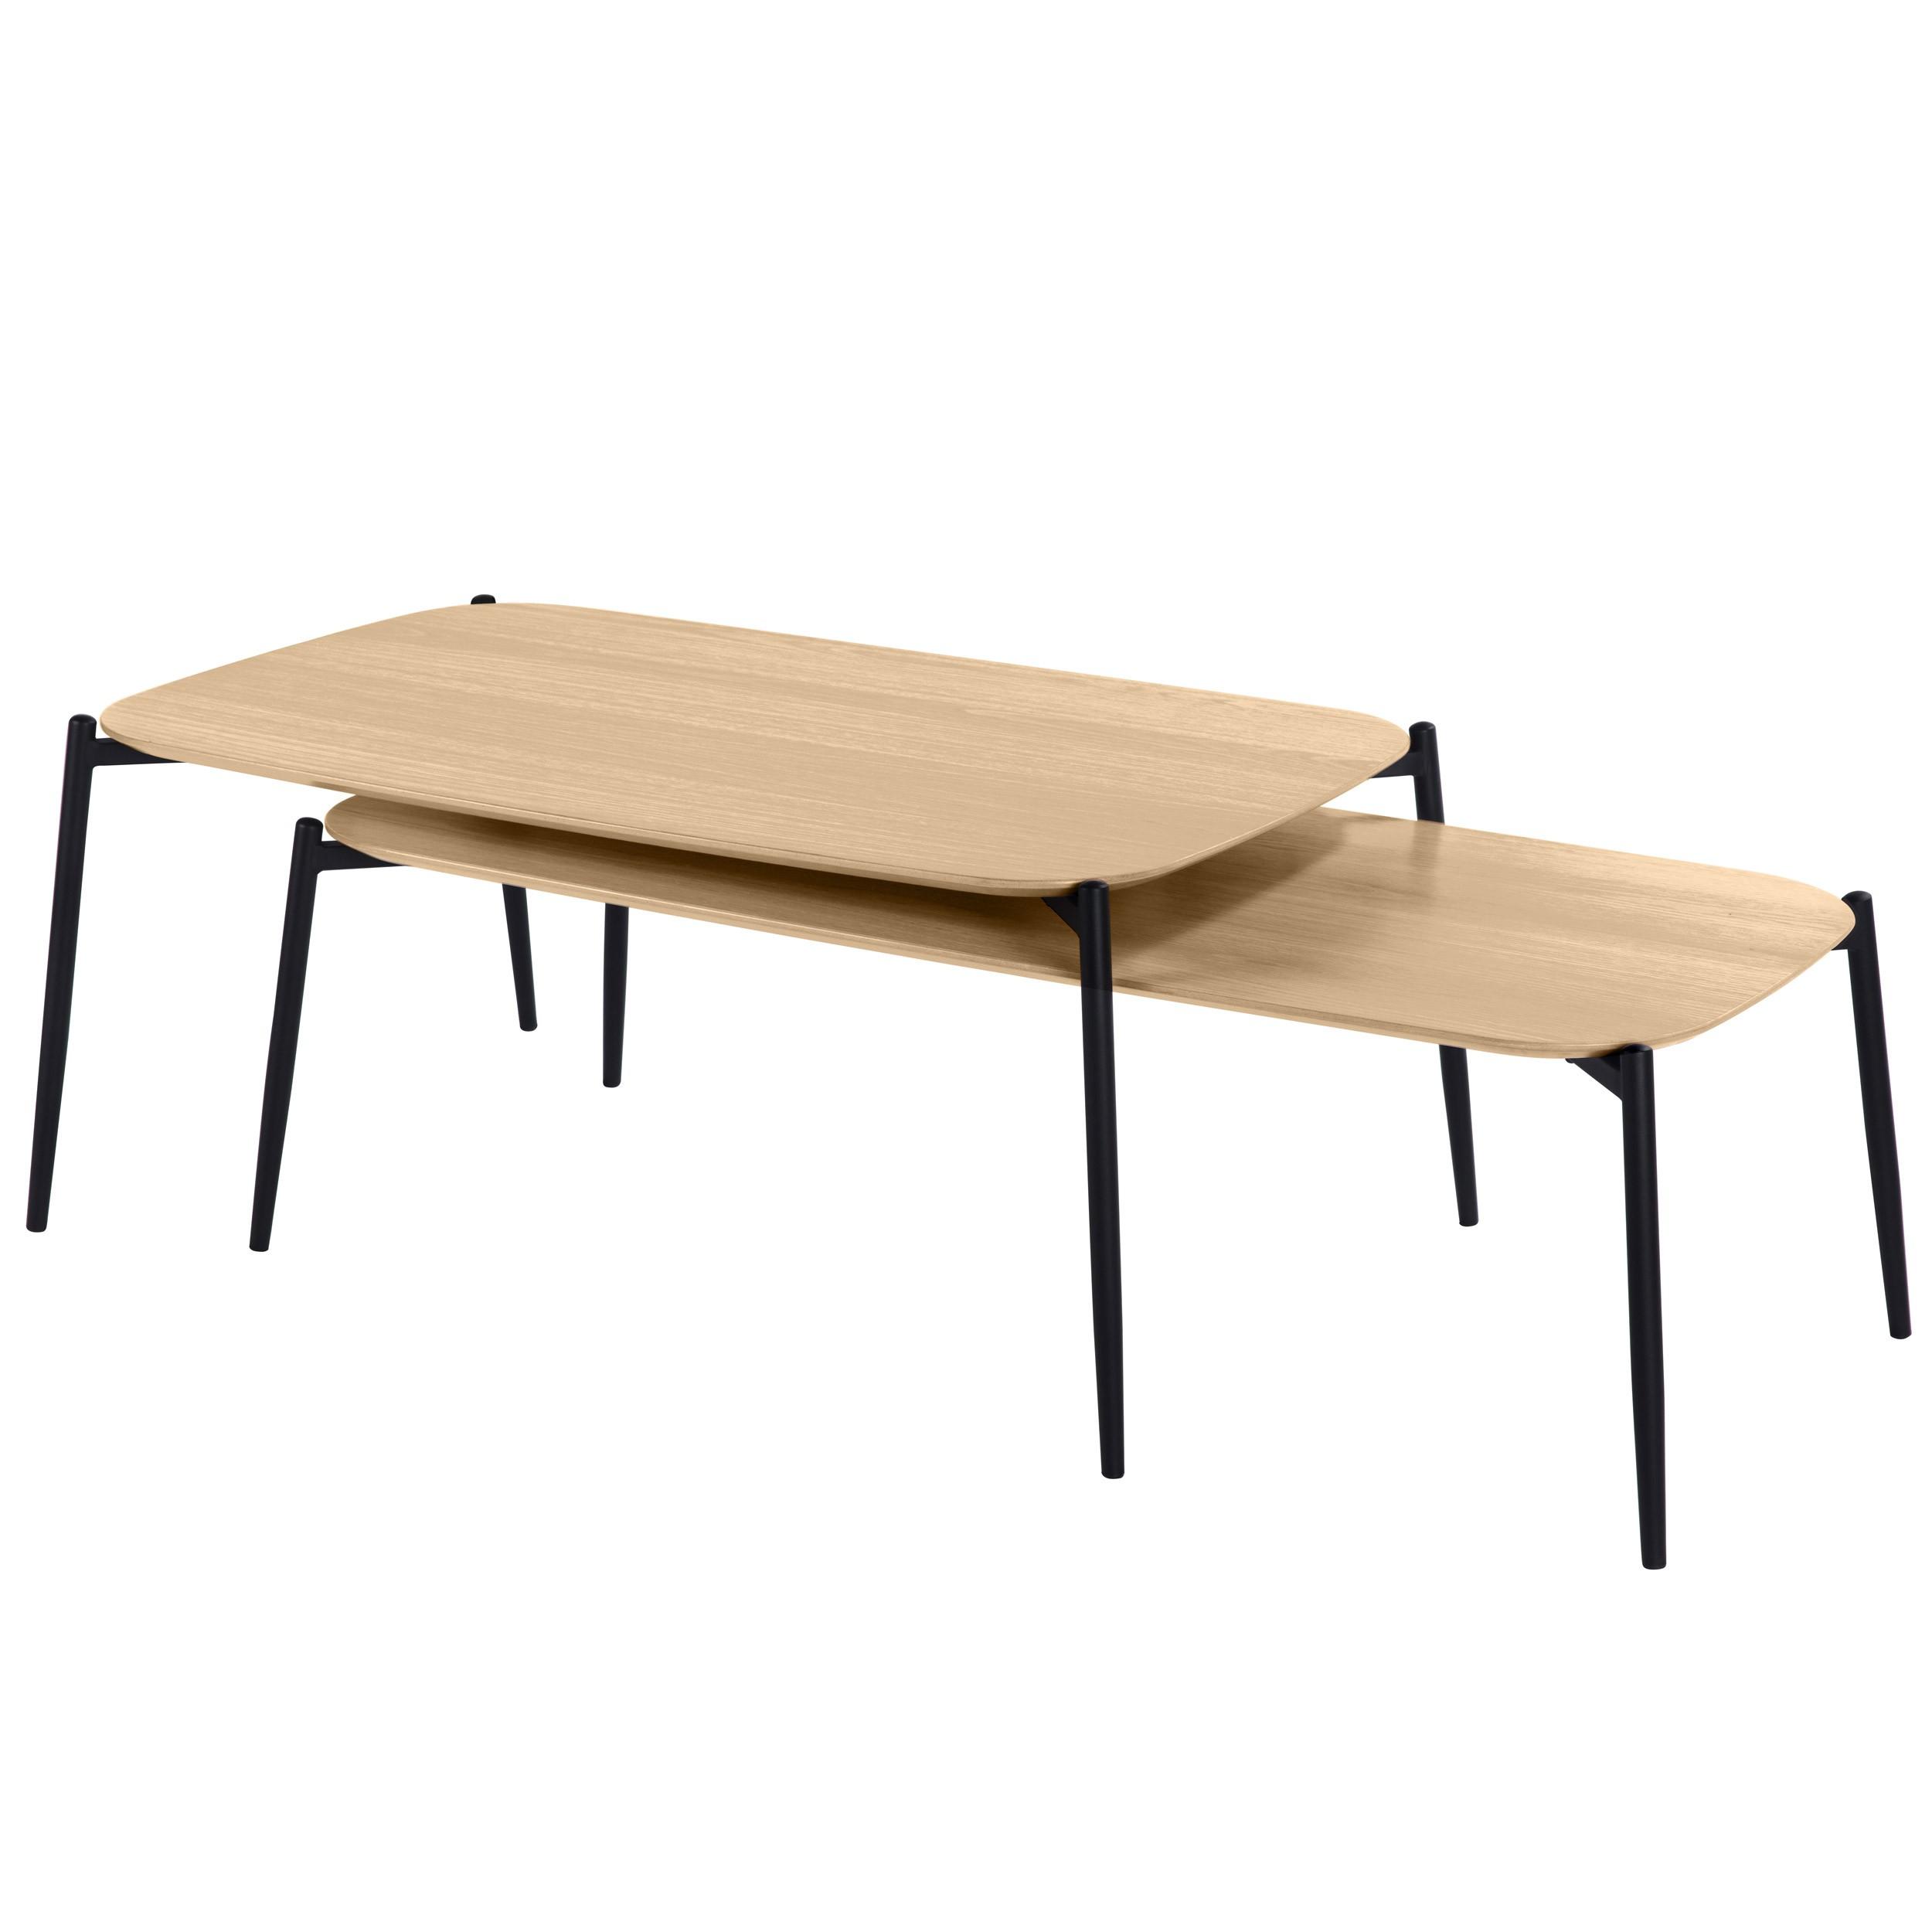 table basse gigogne prissy en bois clair lot de 2 achetez nos tables basses gigognes prissy. Black Bedroom Furniture Sets. Home Design Ideas